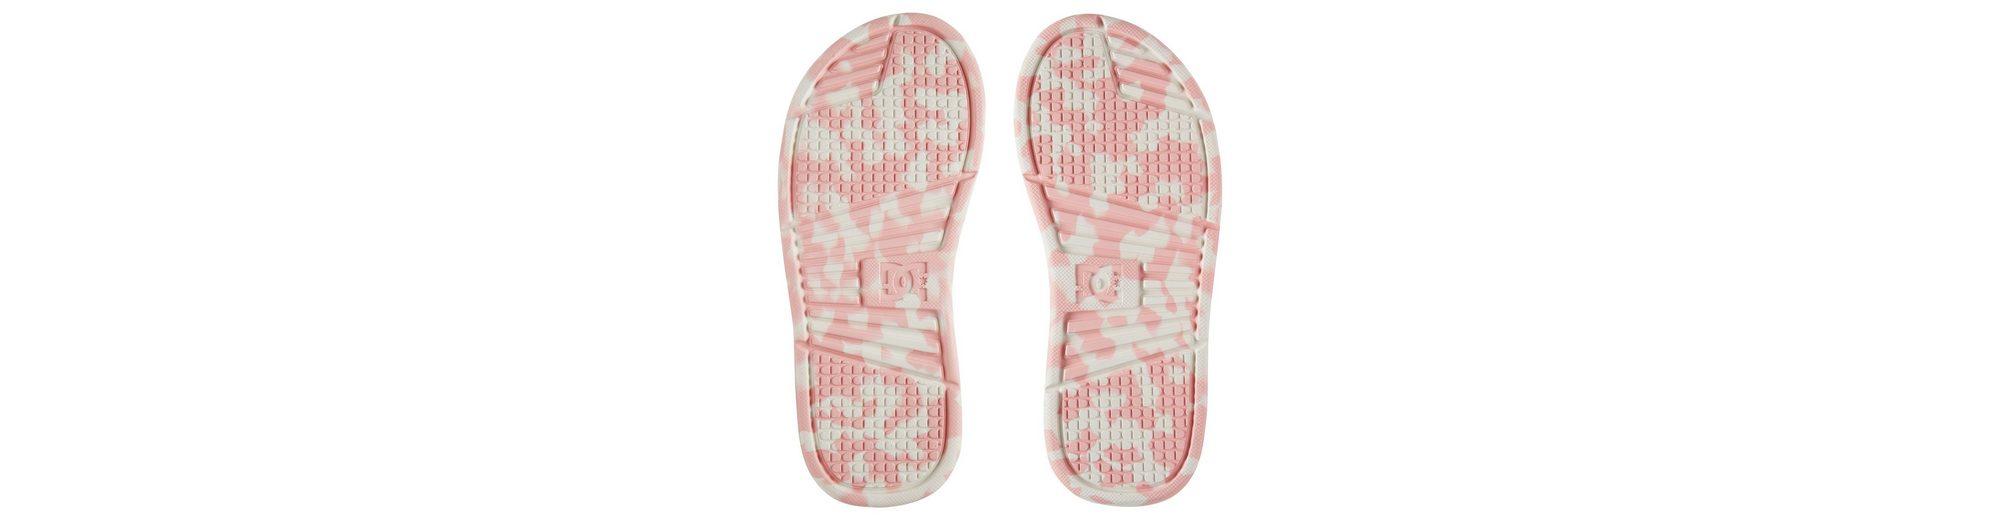 DC Shoes Badeschlappen Bolsa LE Brandneue Unisex Online Angebot Zum Verkauf Großer Verkauf Online E6KF890o